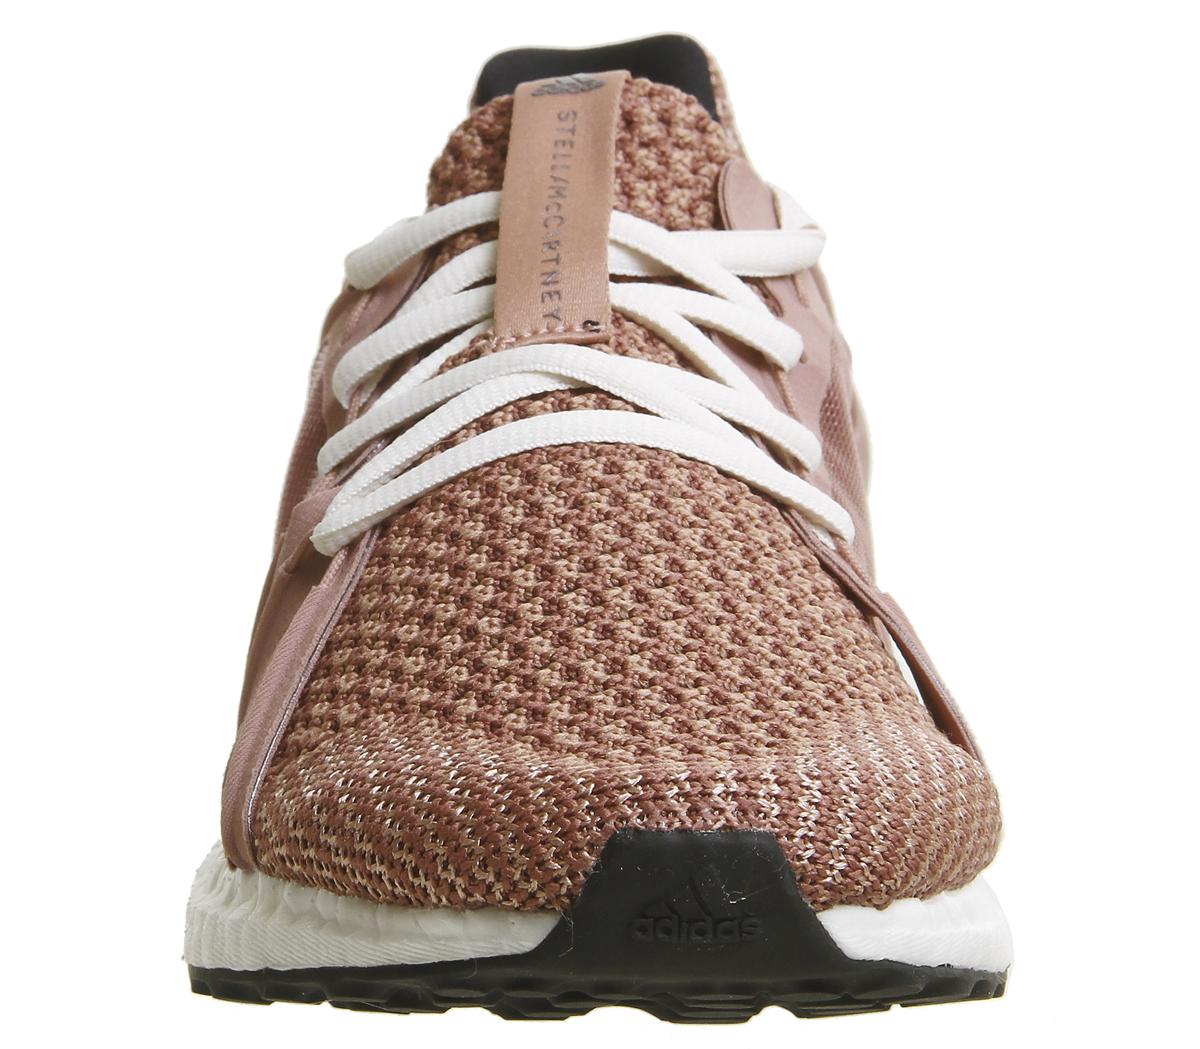 Adidas Stella Mccartney Trainers Womens Raw Pink